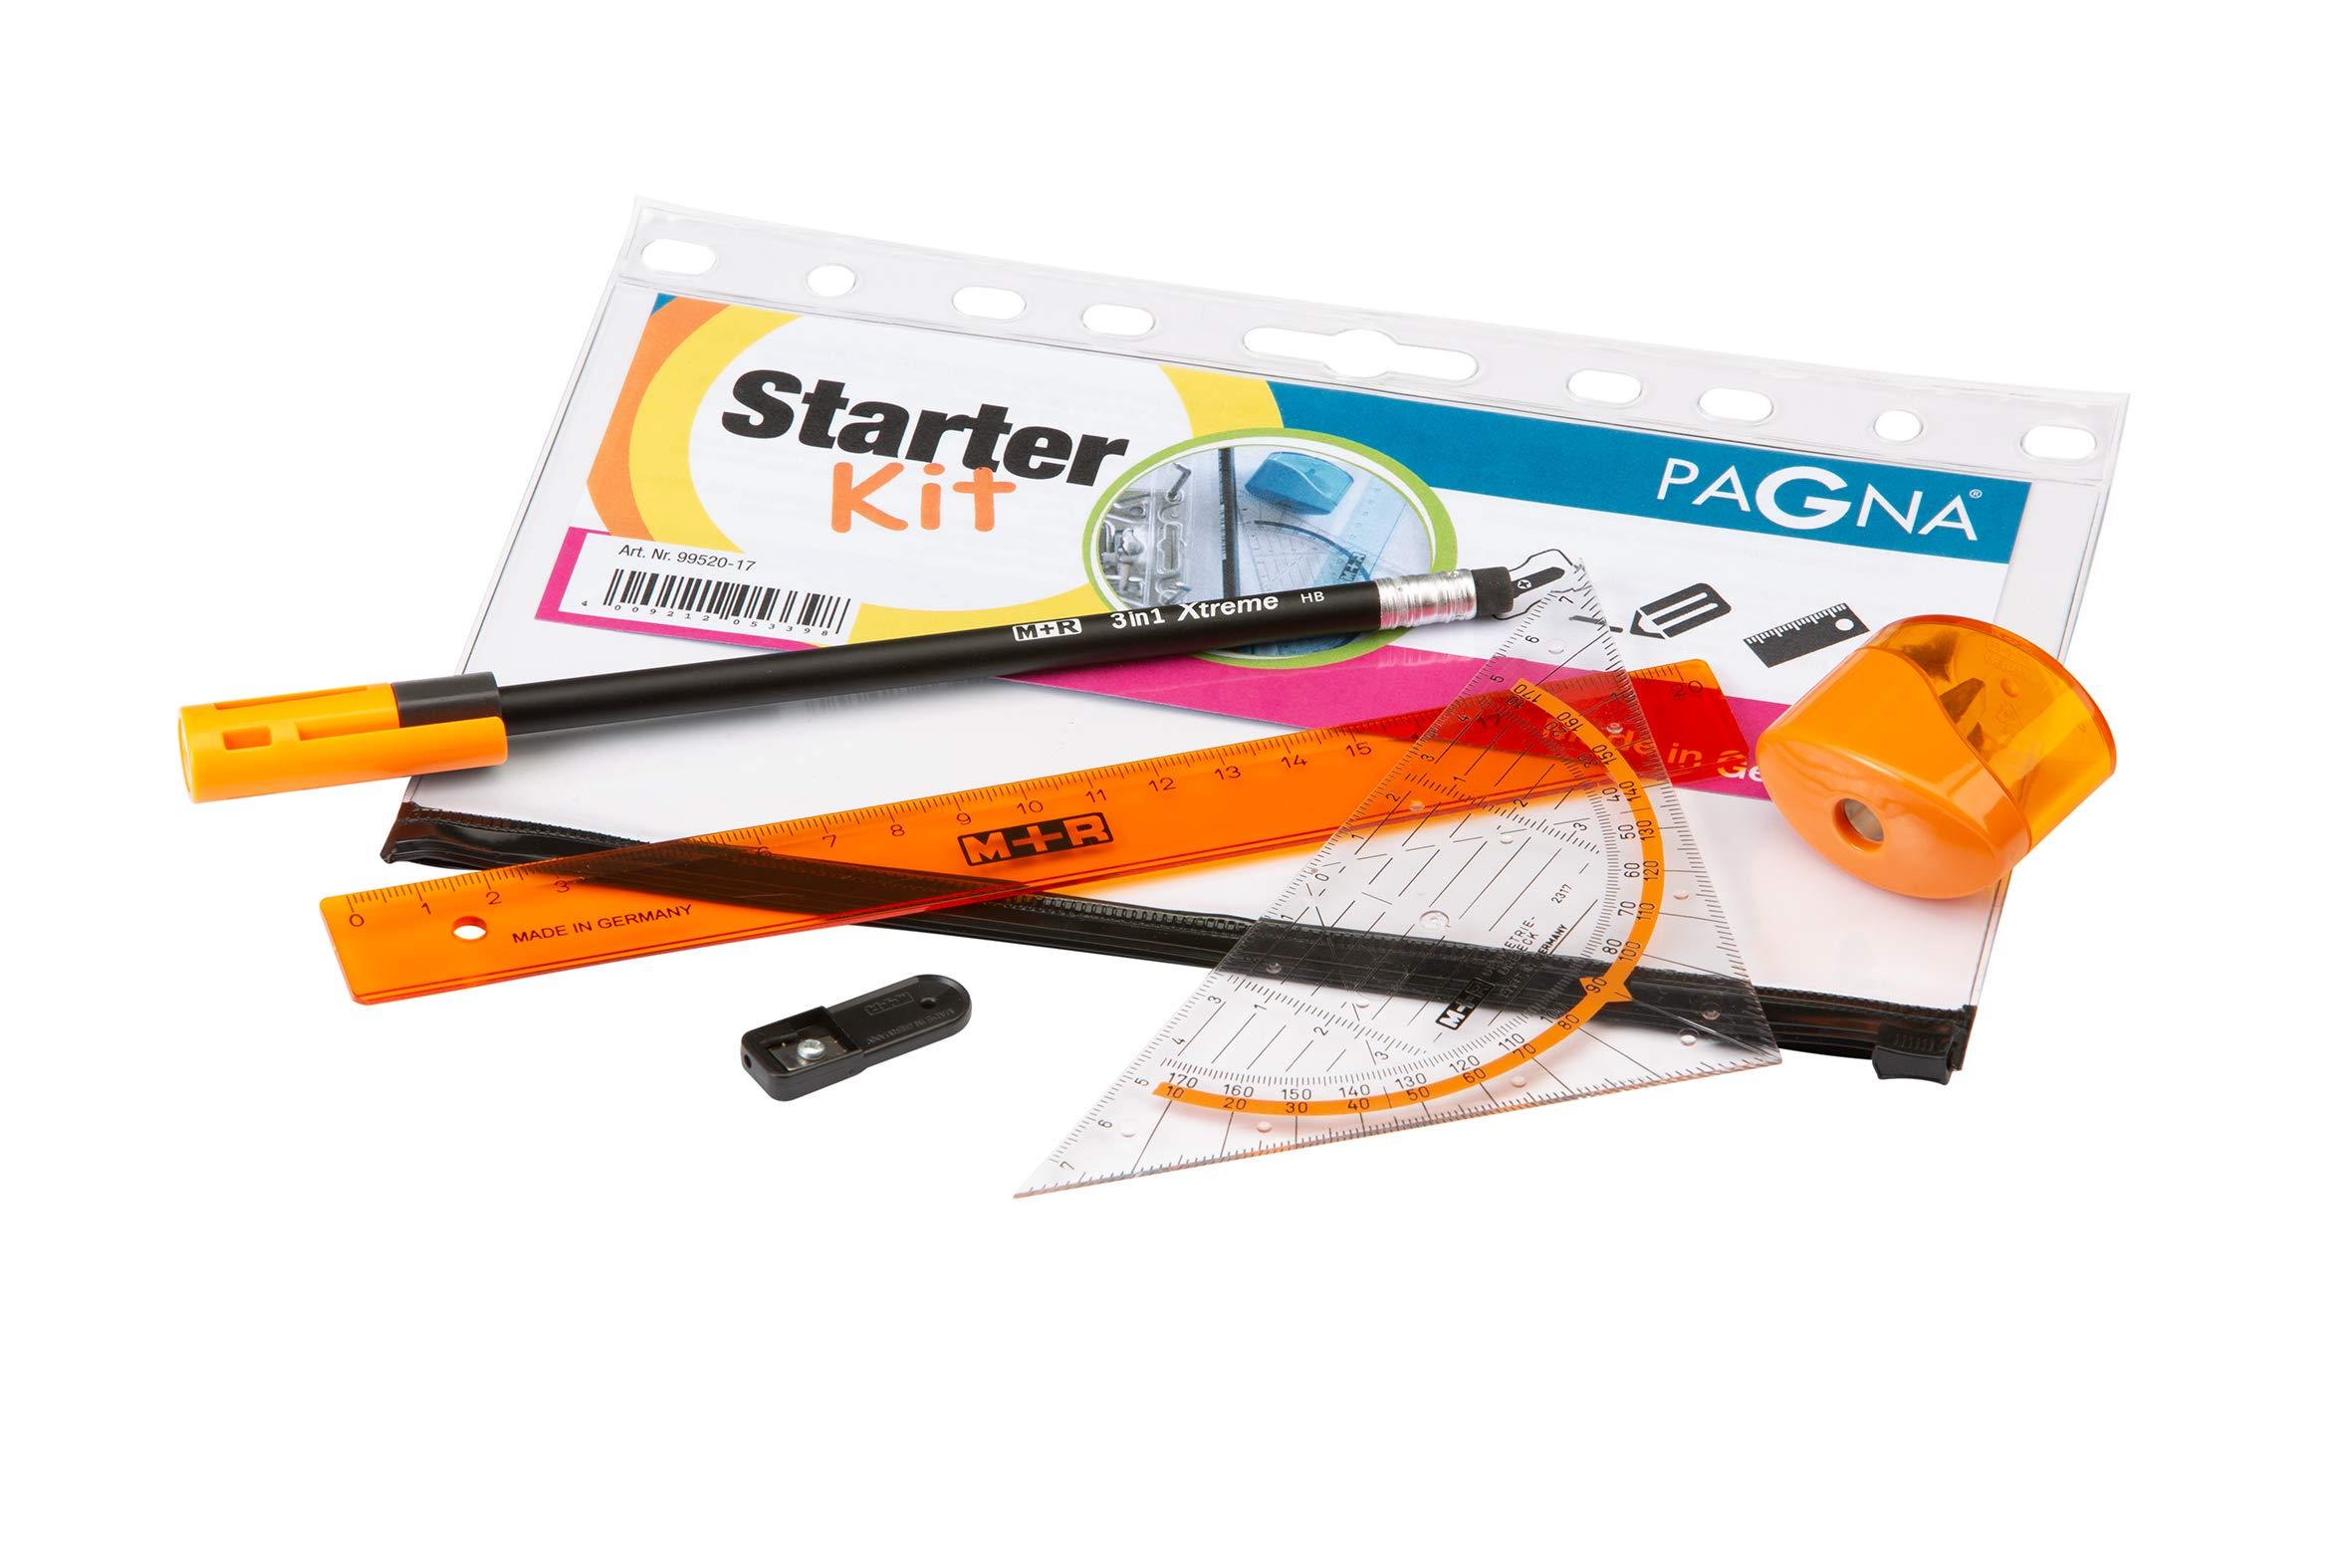 Pagna 9952009Starter Kit Orange Drawing Set for Filing), Sharpener, Ruler, Geometric Triangle & Pencil